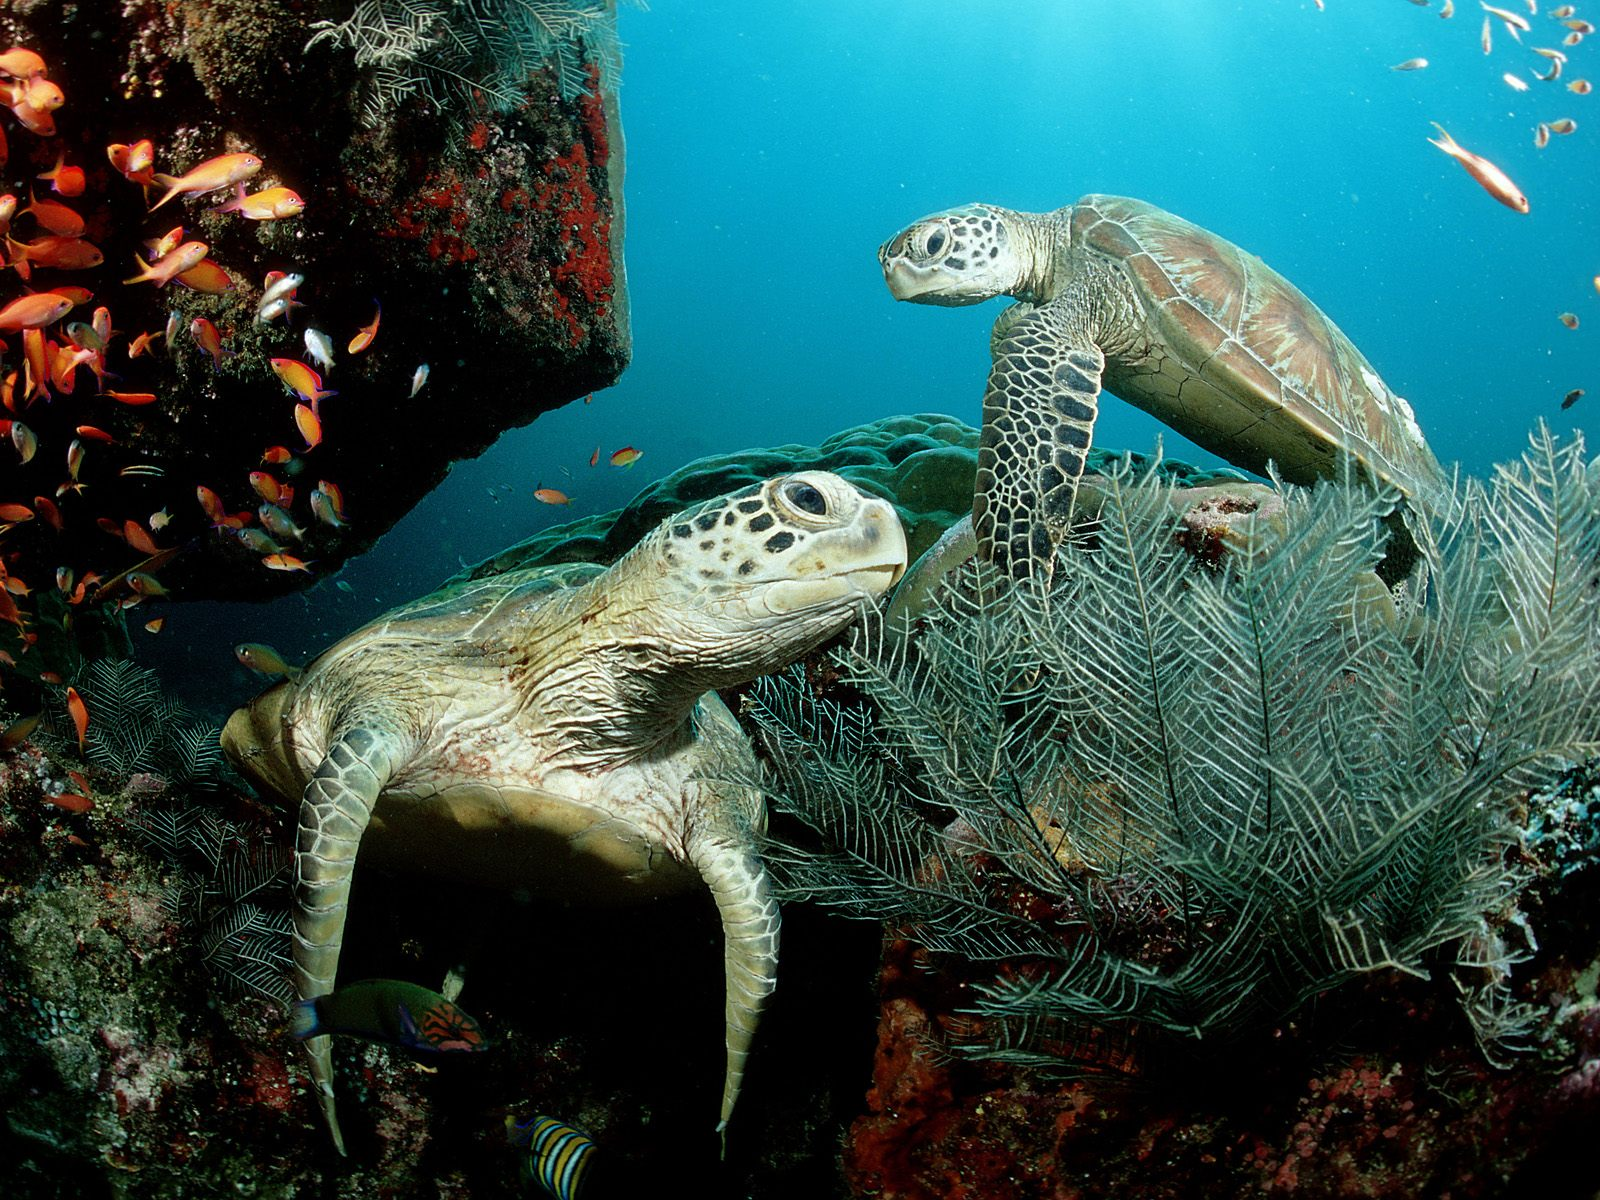 Christine ODonnell green sea turtle wallpaper 1600x1200